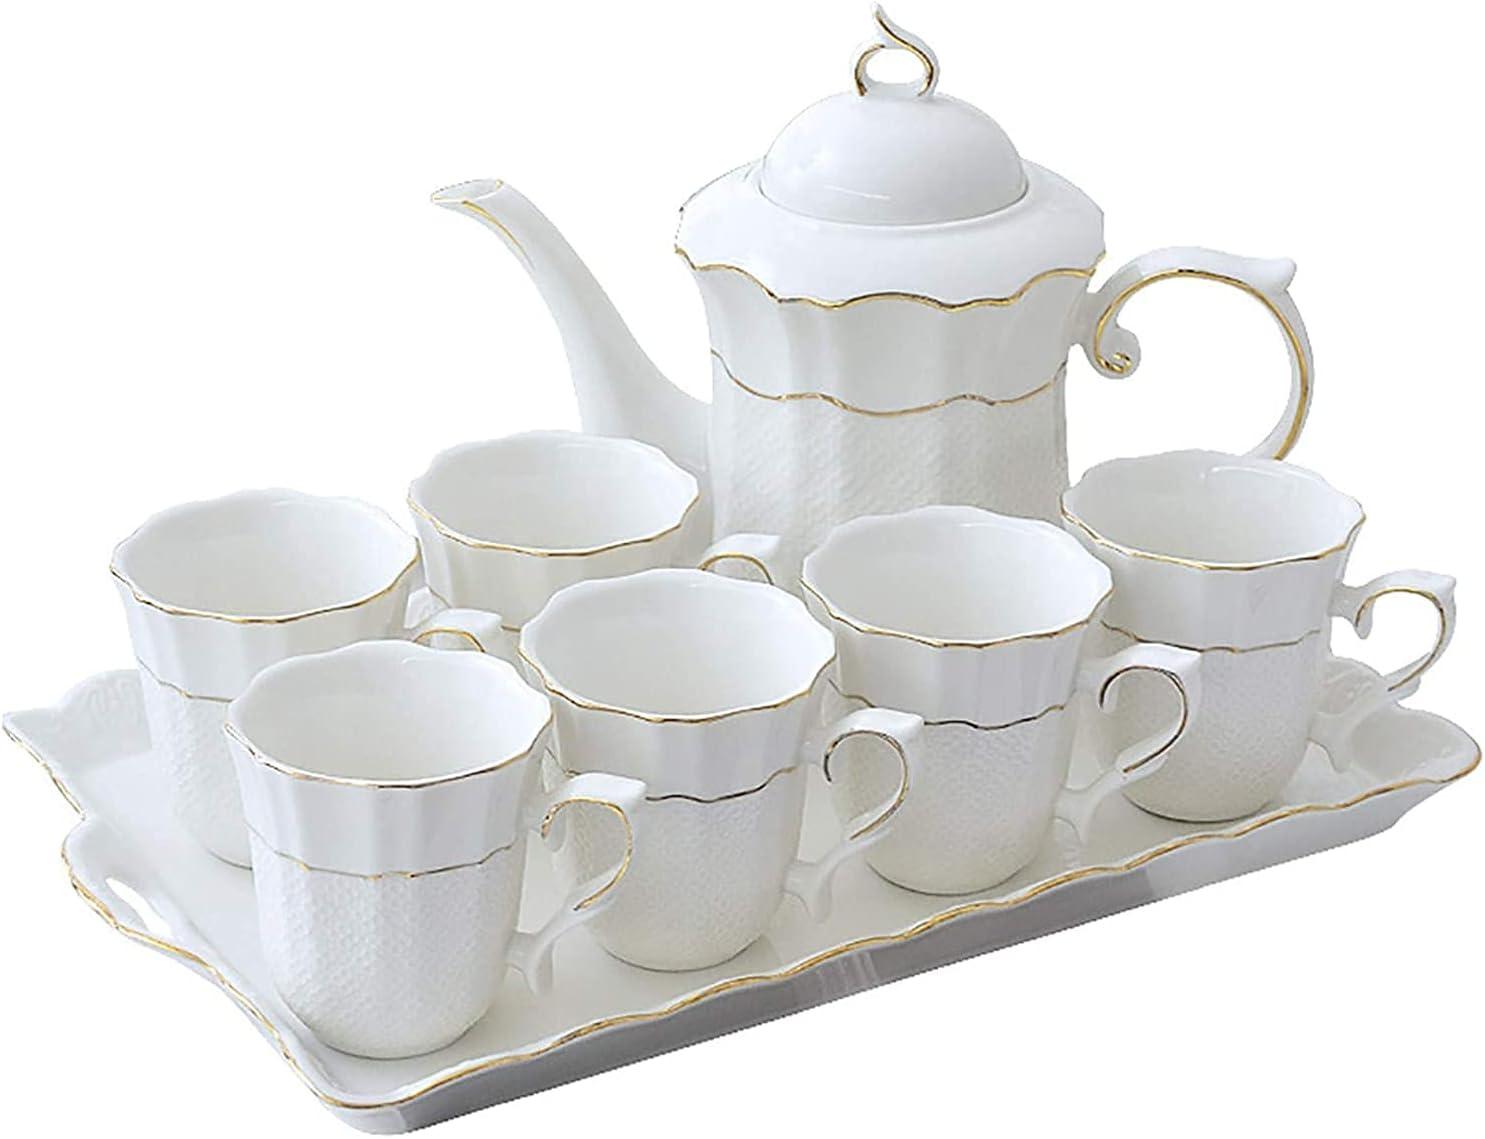 TEAYASON European quality assurance Pastoral Style Simple Bone Nippon regular agency S 8-Piece Tea China